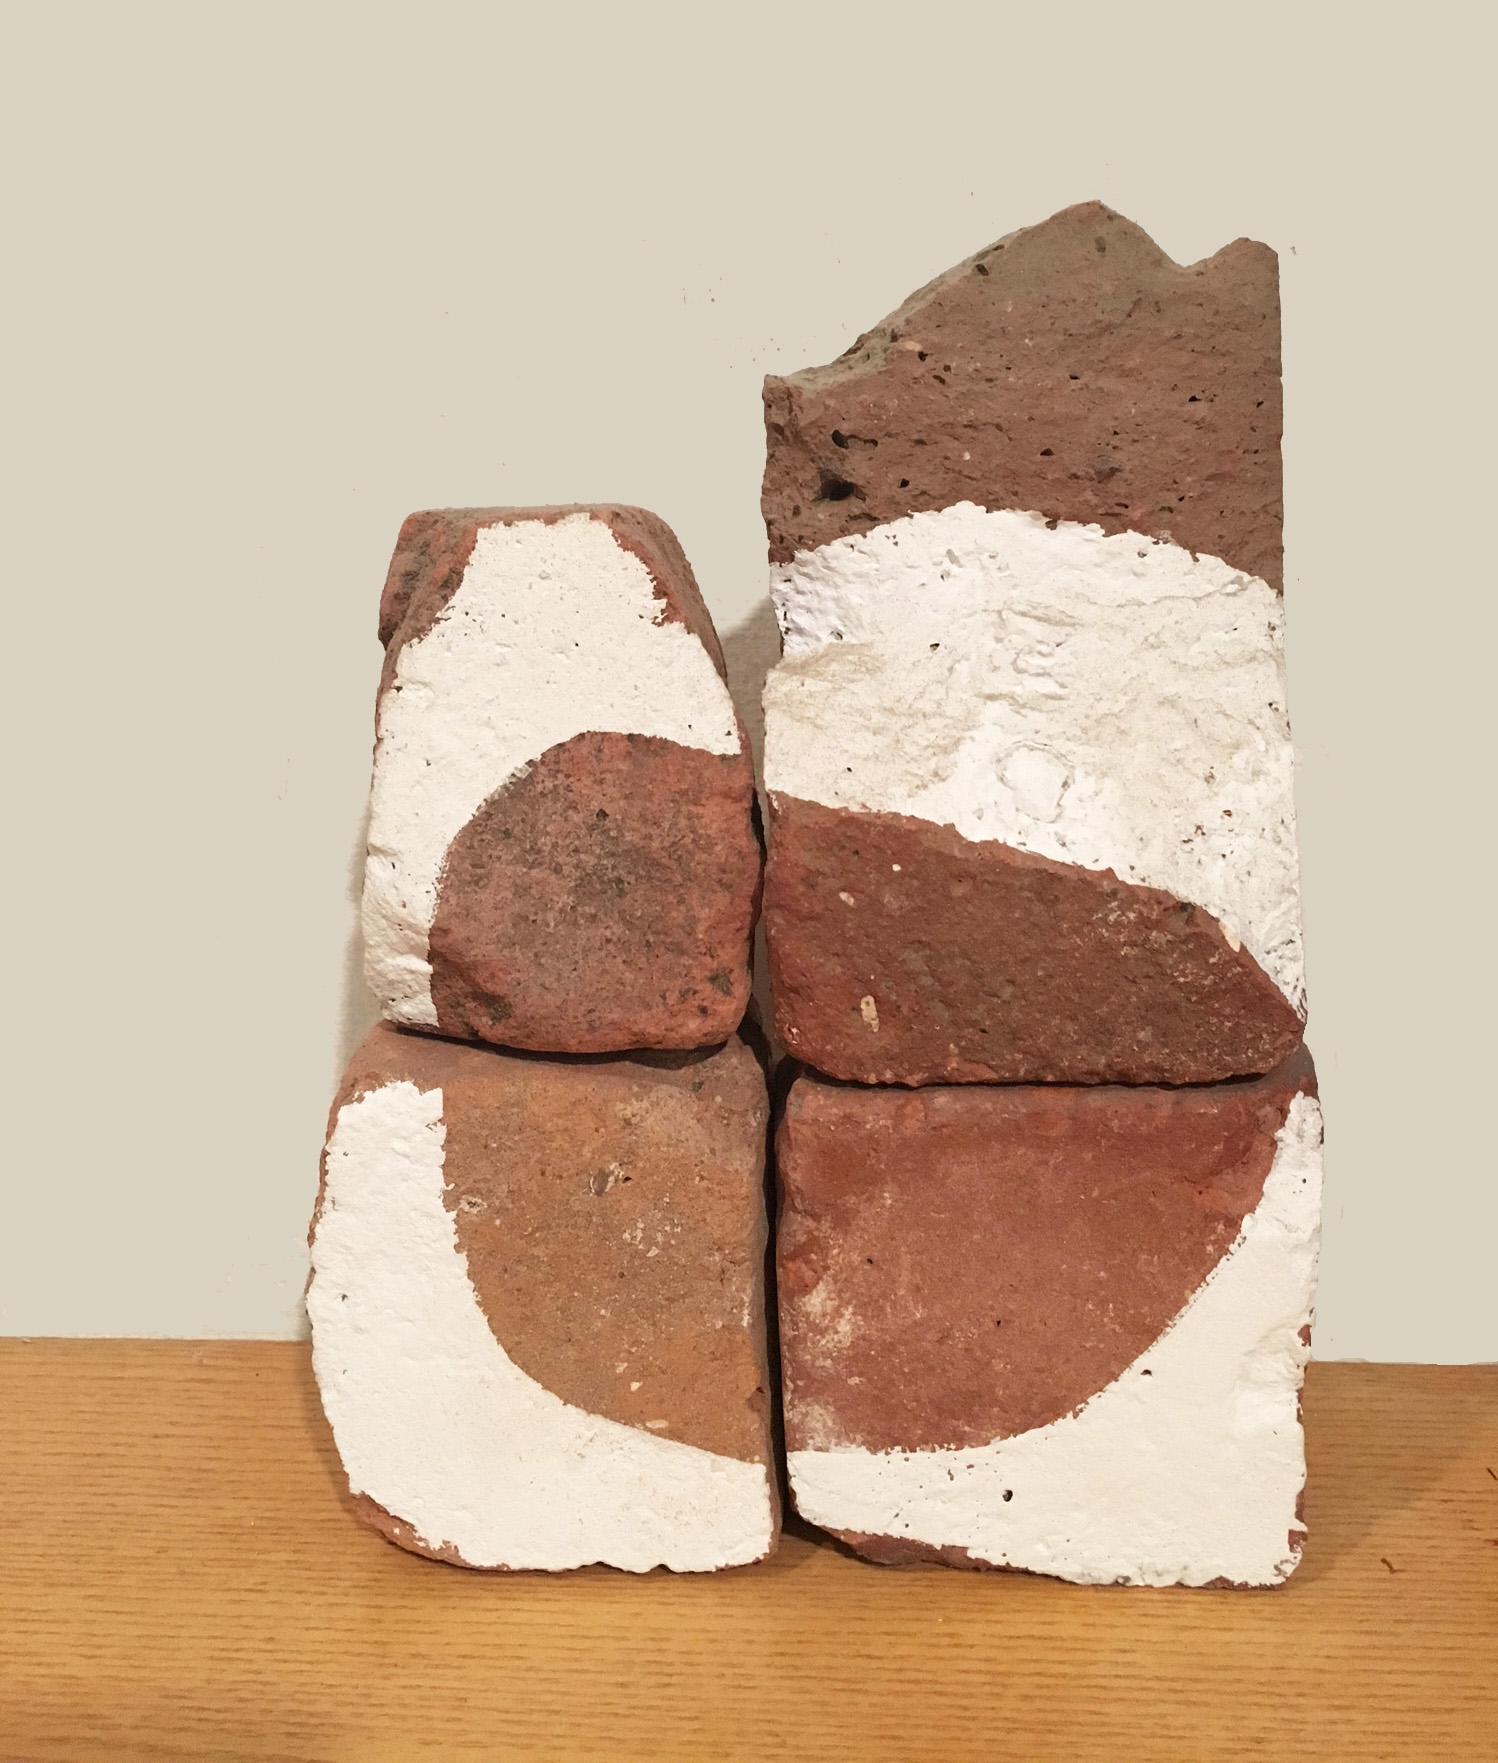 Brick-a-Brac 8    1 0 x 7 x 3 inches    Acrylic on Bricks 2000